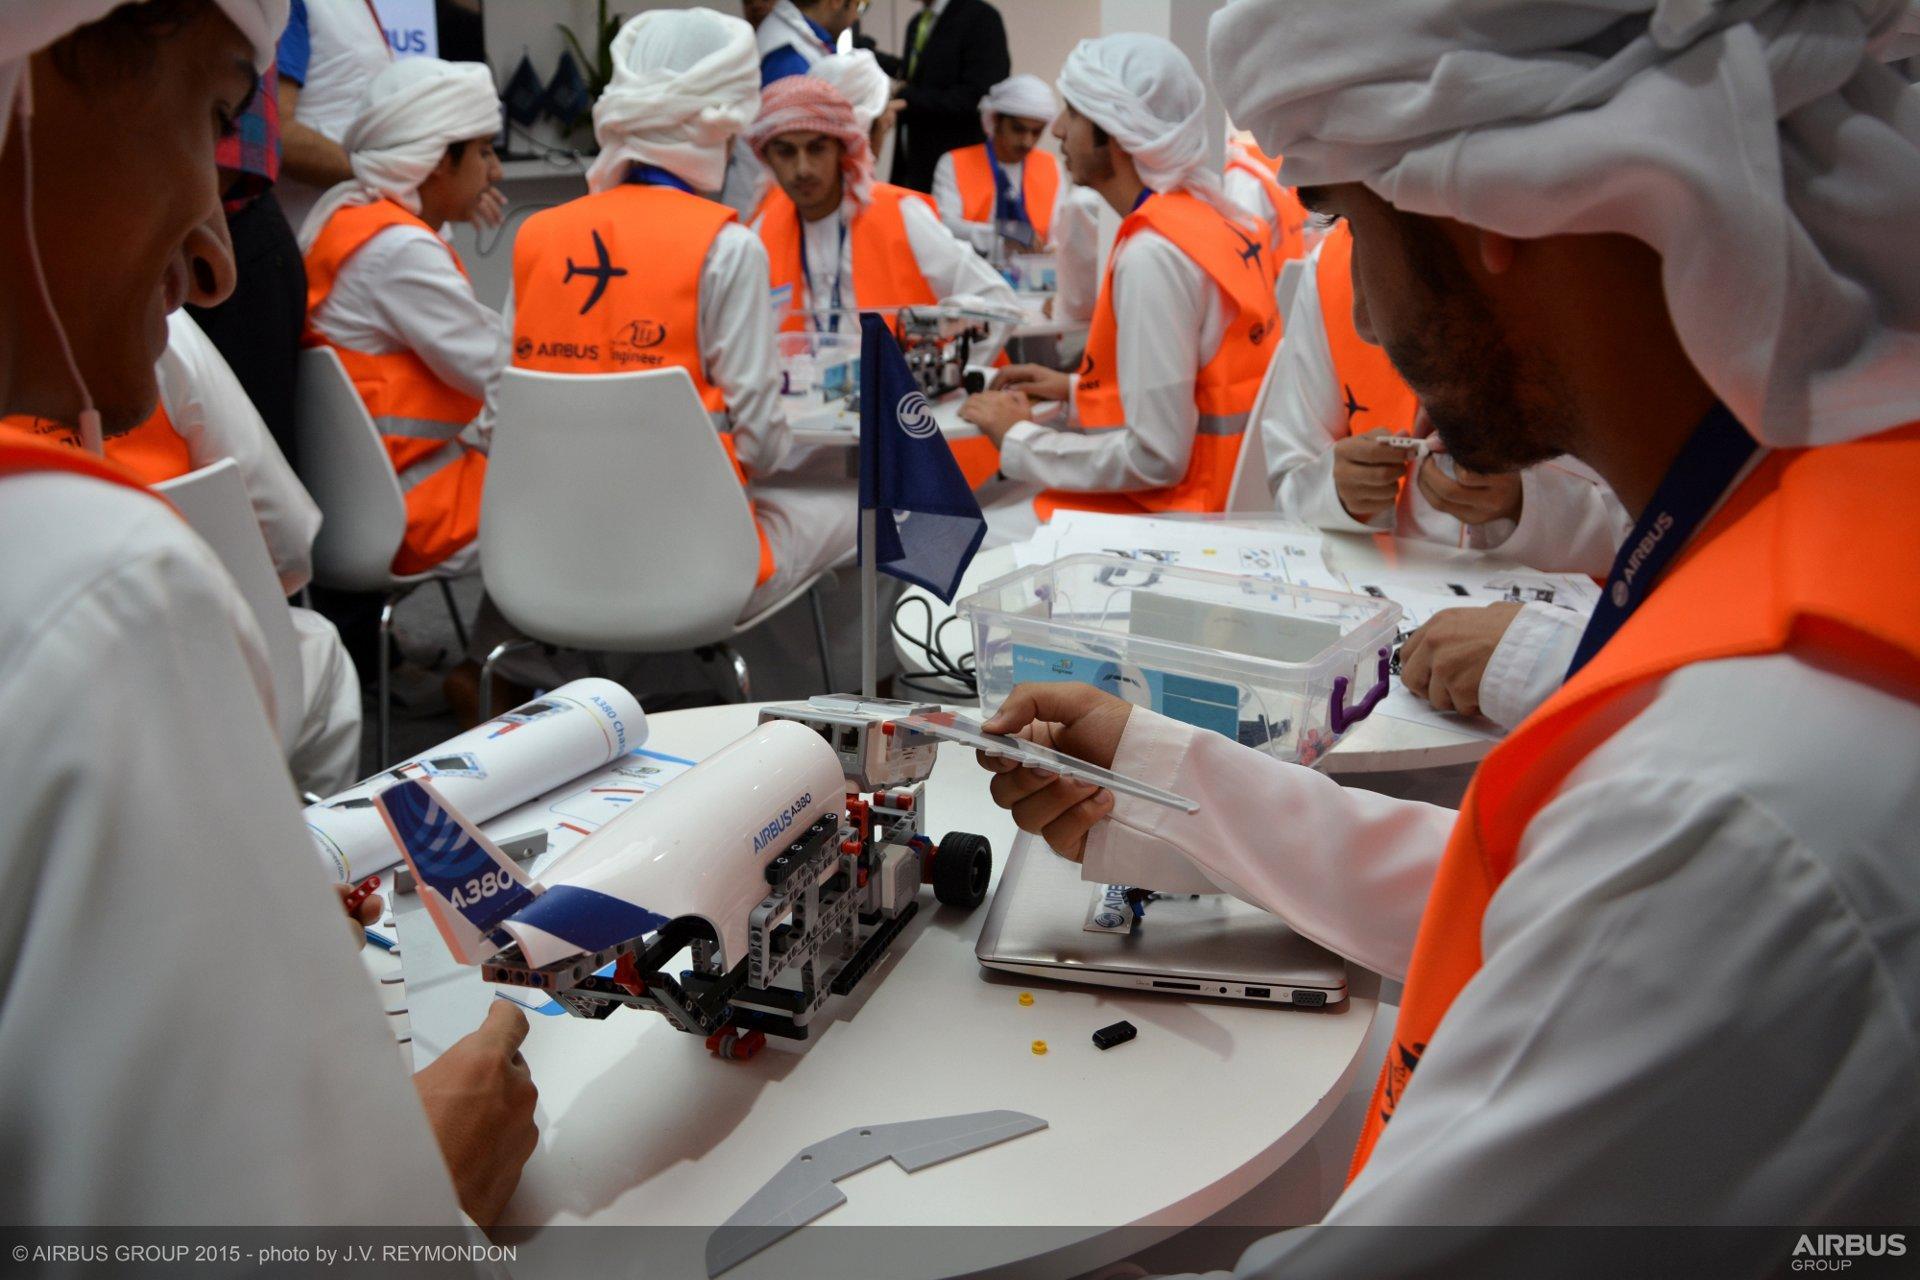 Airbus Little Engineer initiative_2